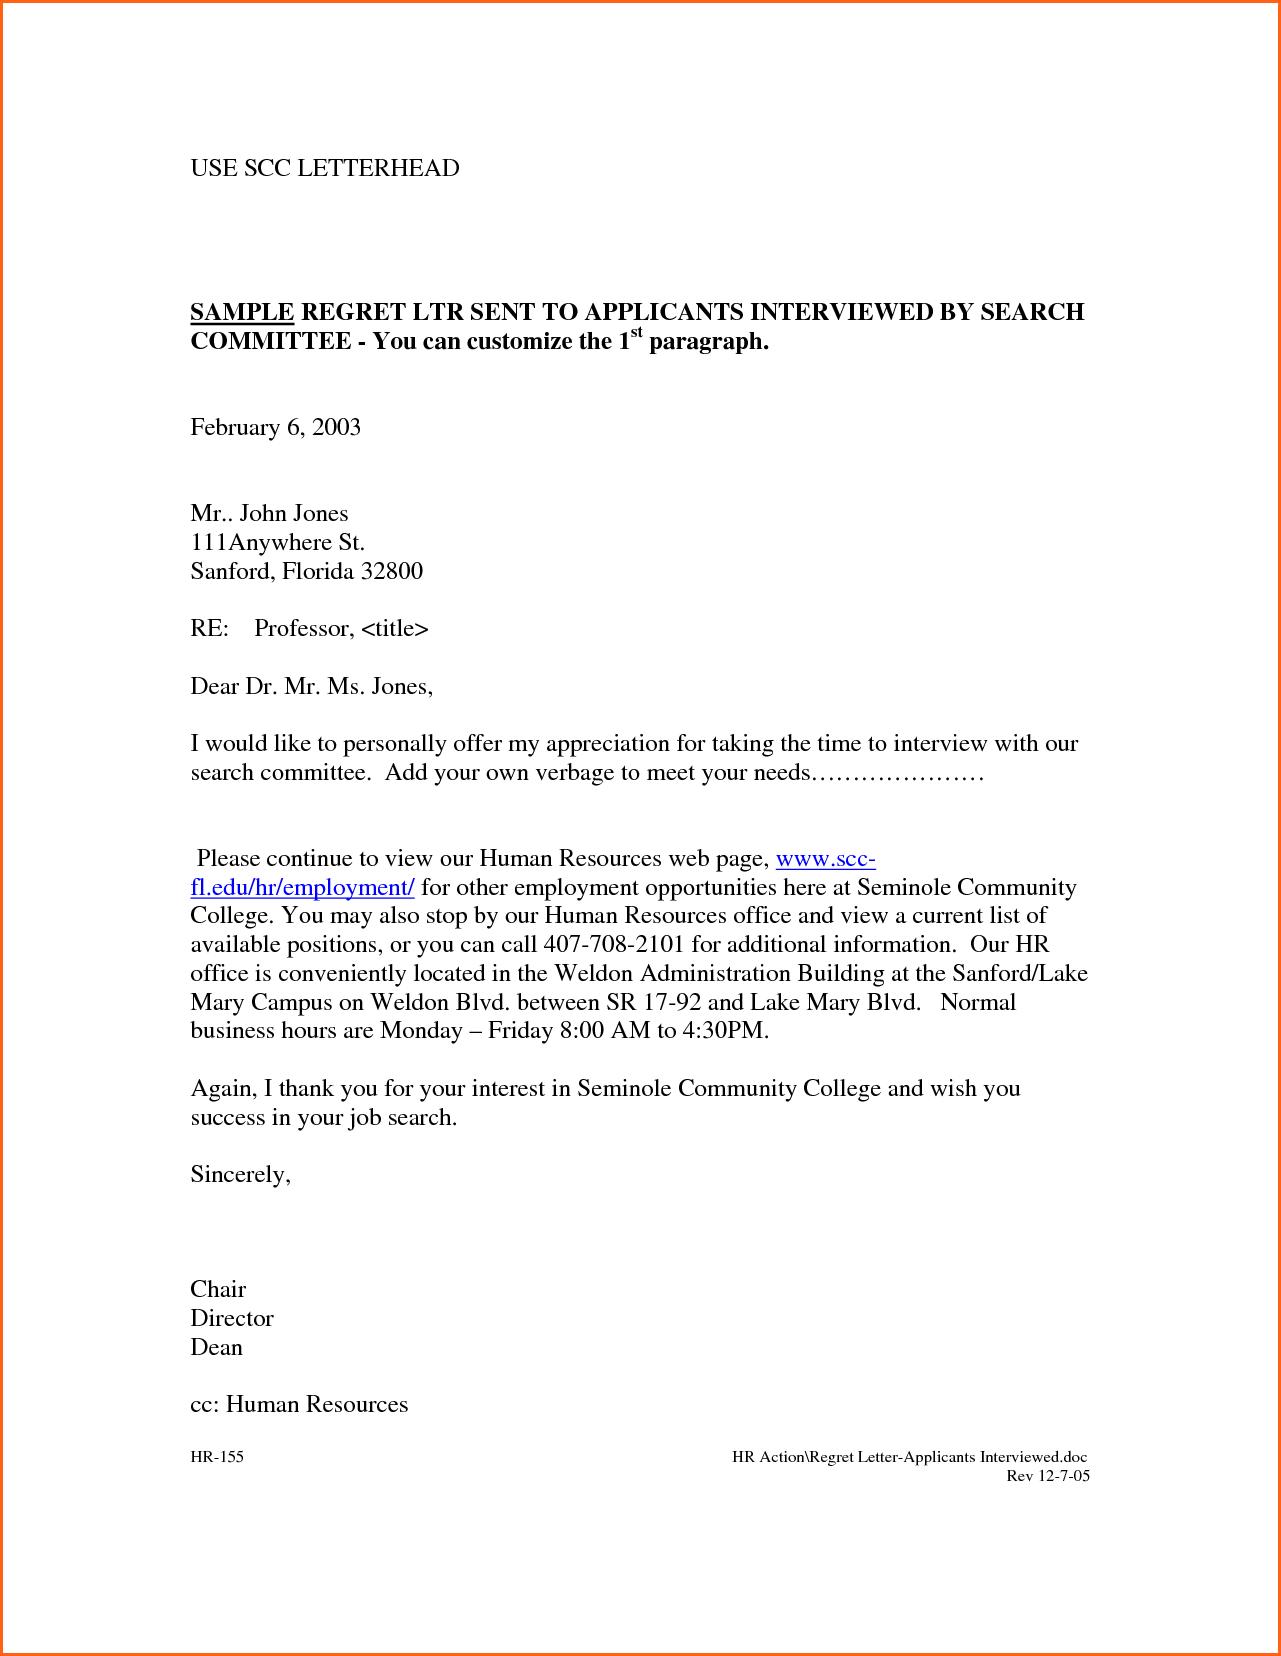 Free sop template business letterhead parent letter word pdf free sop template business letterhead parent letter word pdf documents download spiritdancerdesigns Image collections